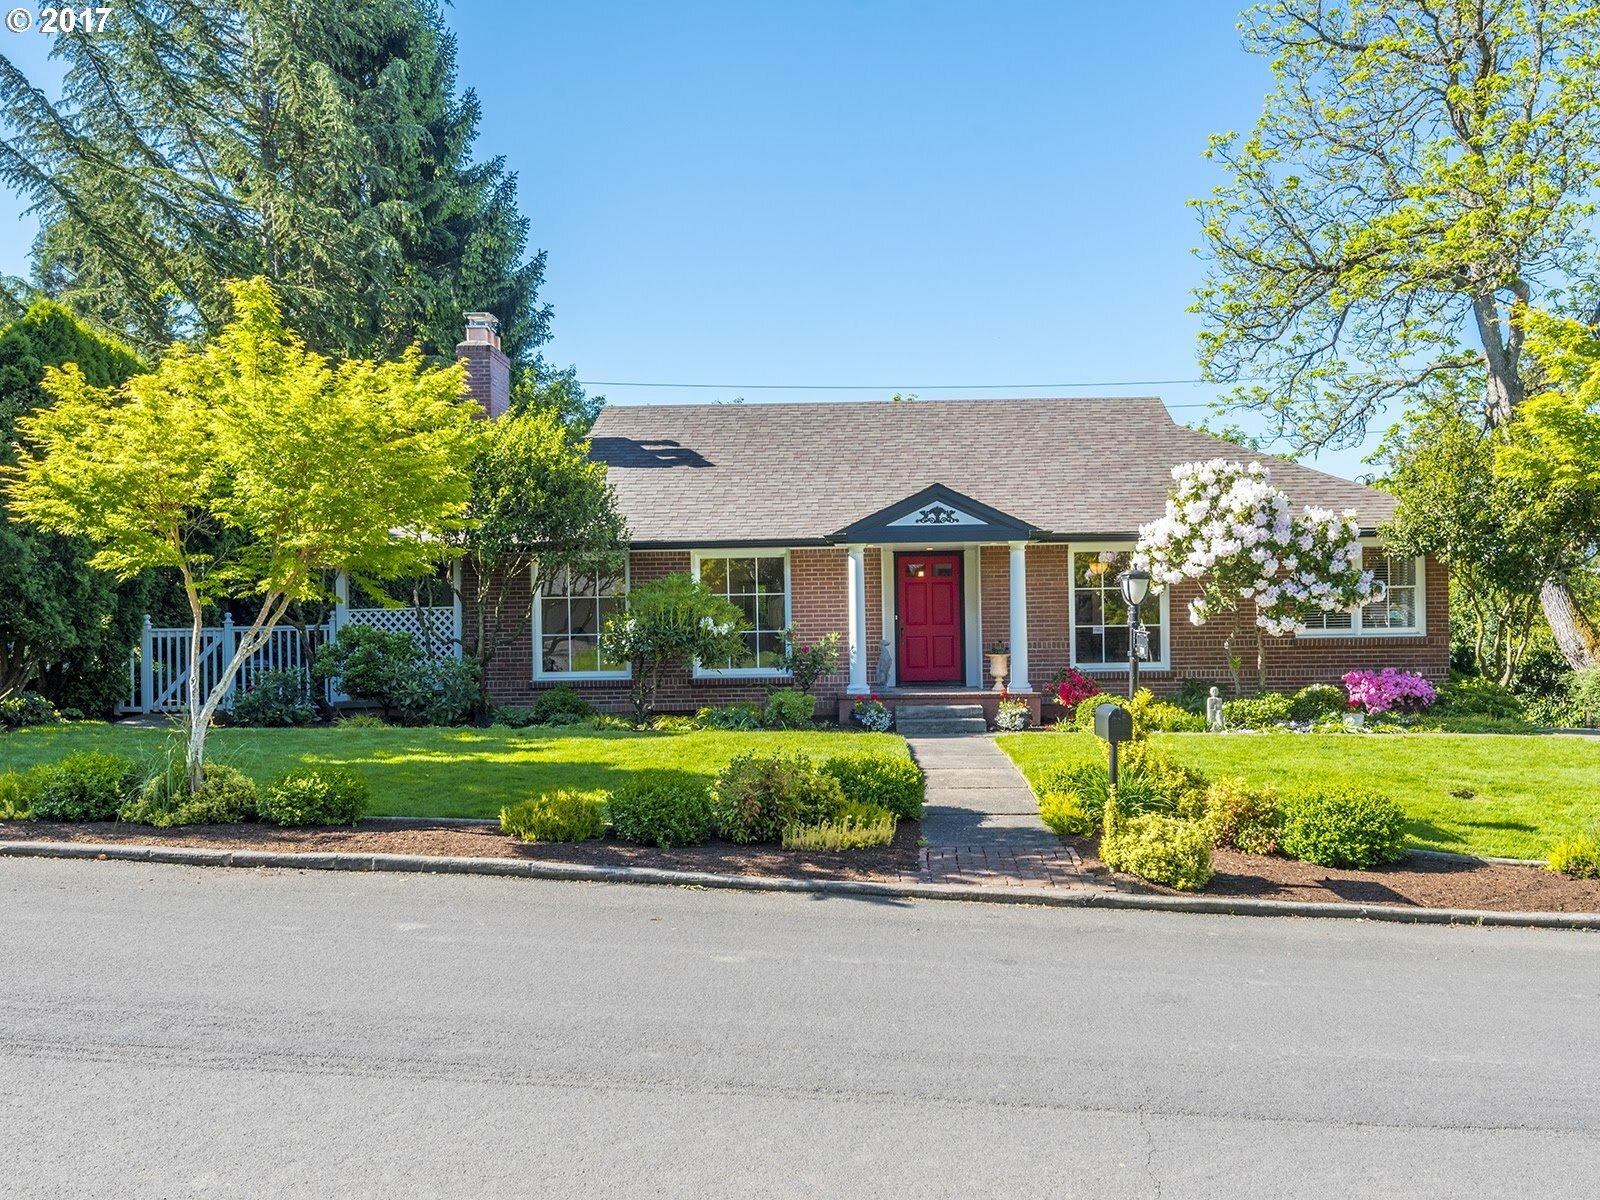 7780 Sw Maple Dr, Portland, OR - USA (photo 1)